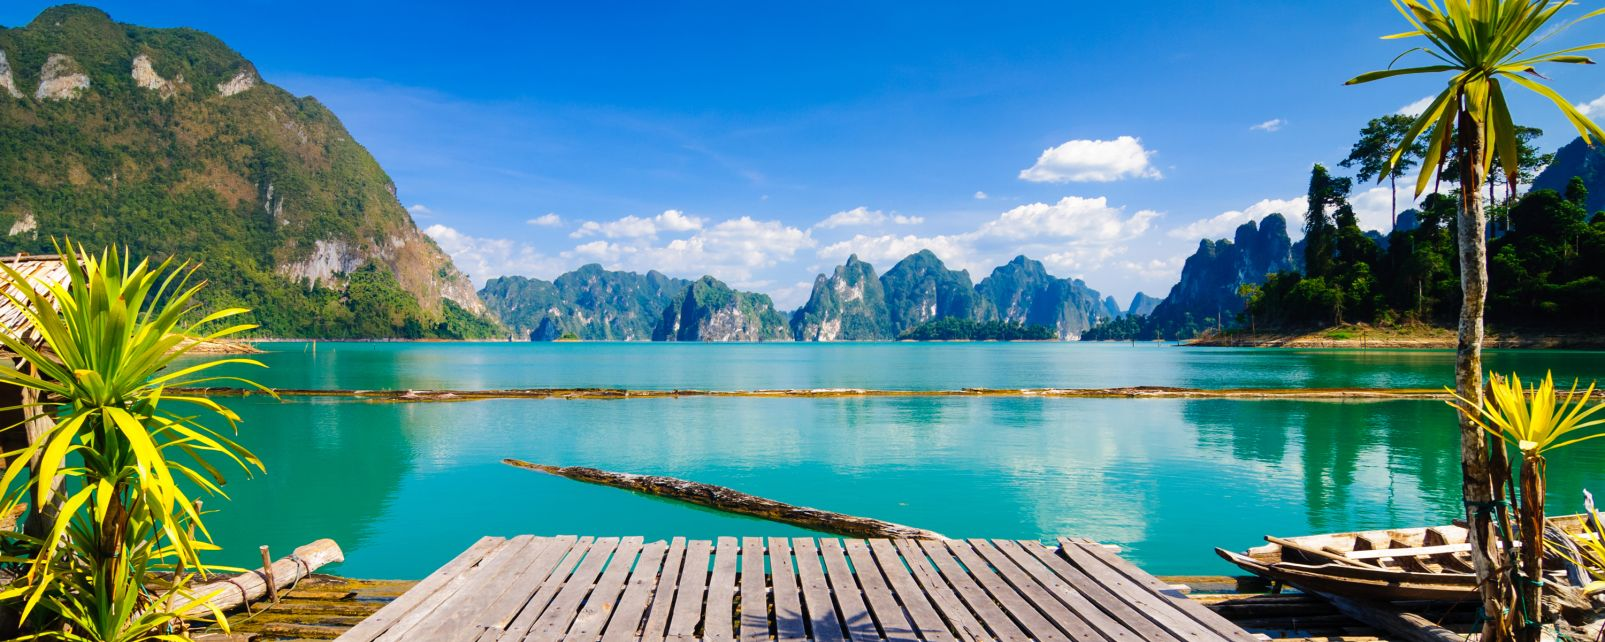 thailande paysage - Photo